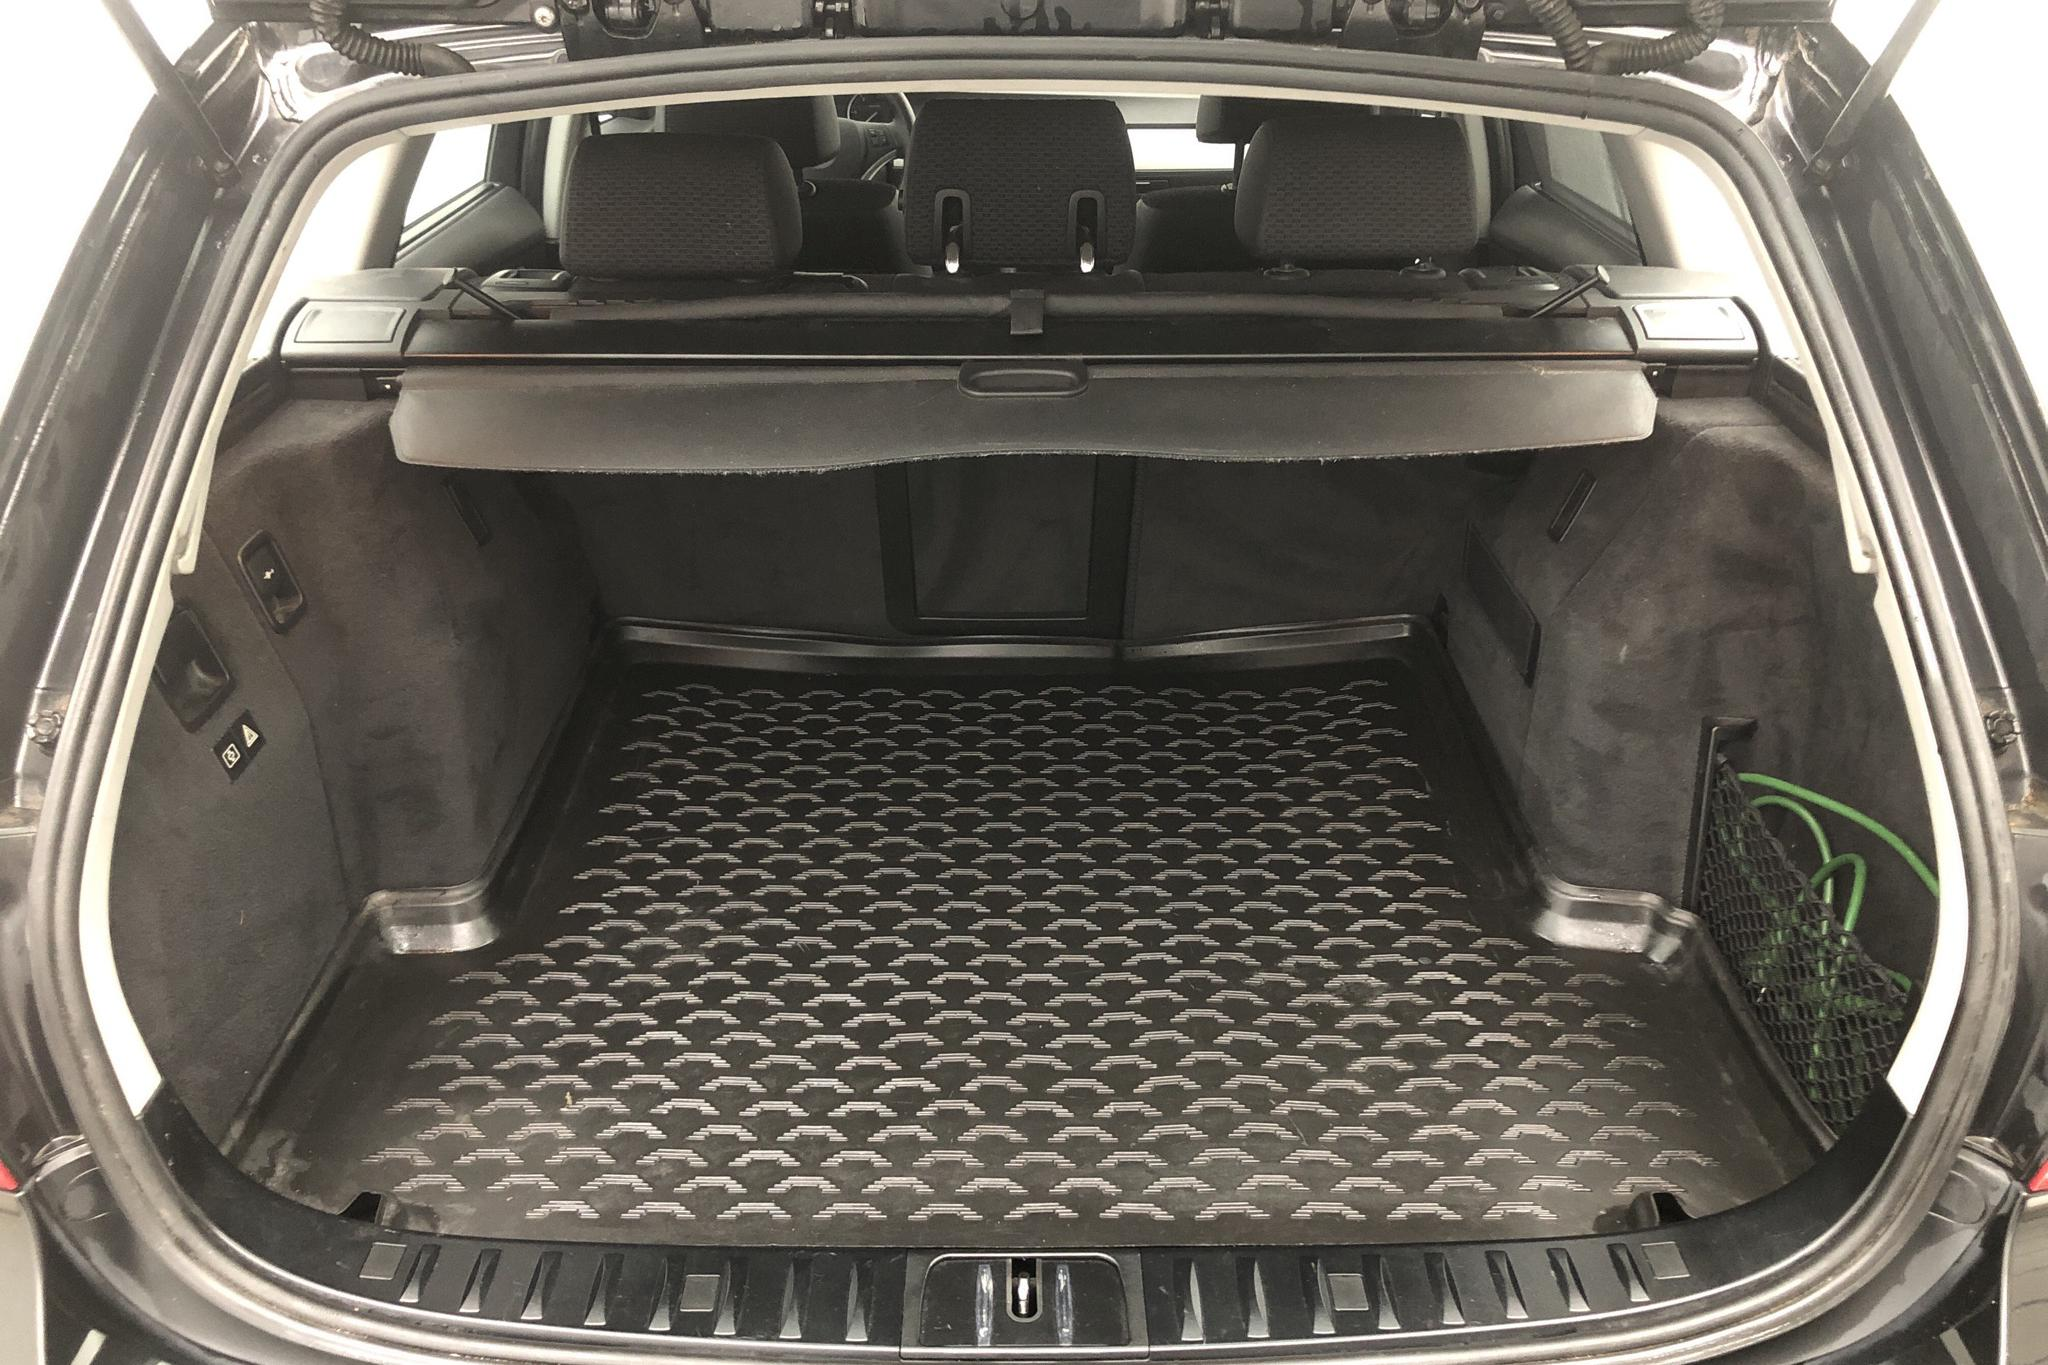 BMW 318d Touring, E91 (143hk) - 6 589 mil - Manuell - svart - 2011